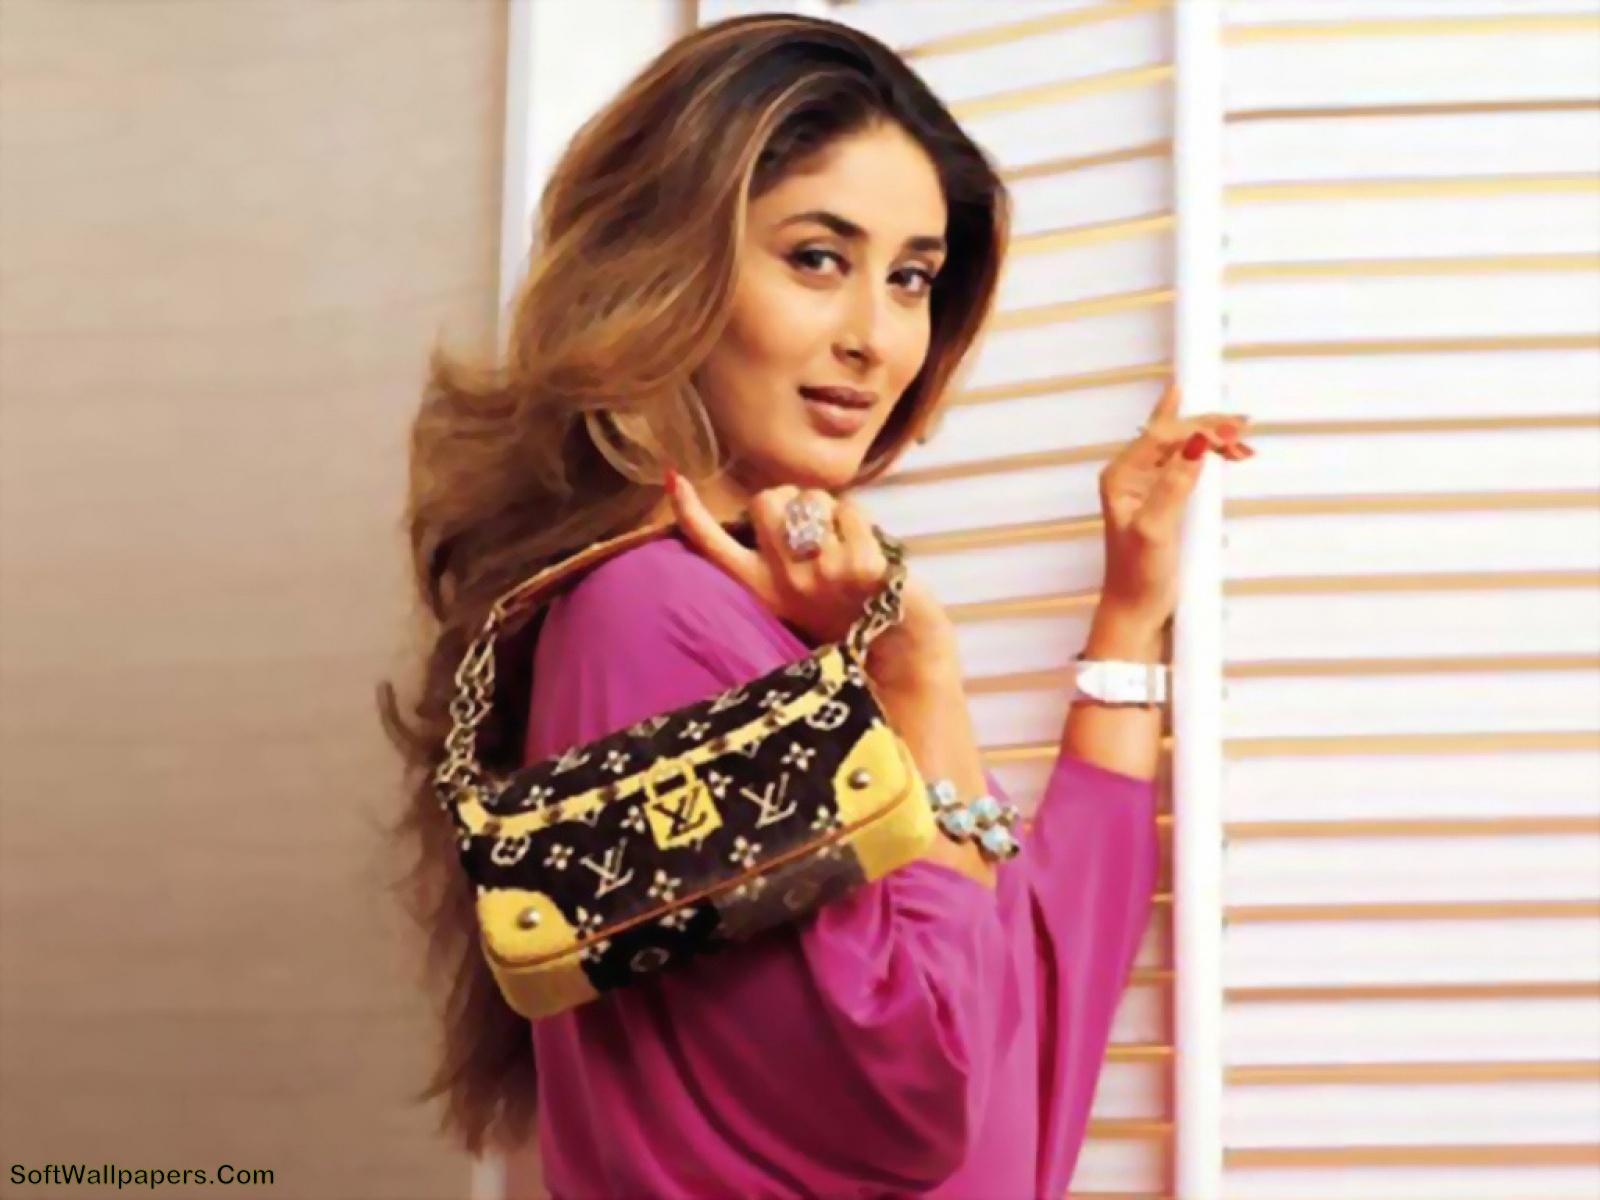 Kareena Kapoor Hot HD Wallpapers ~ Soft Wallpapers